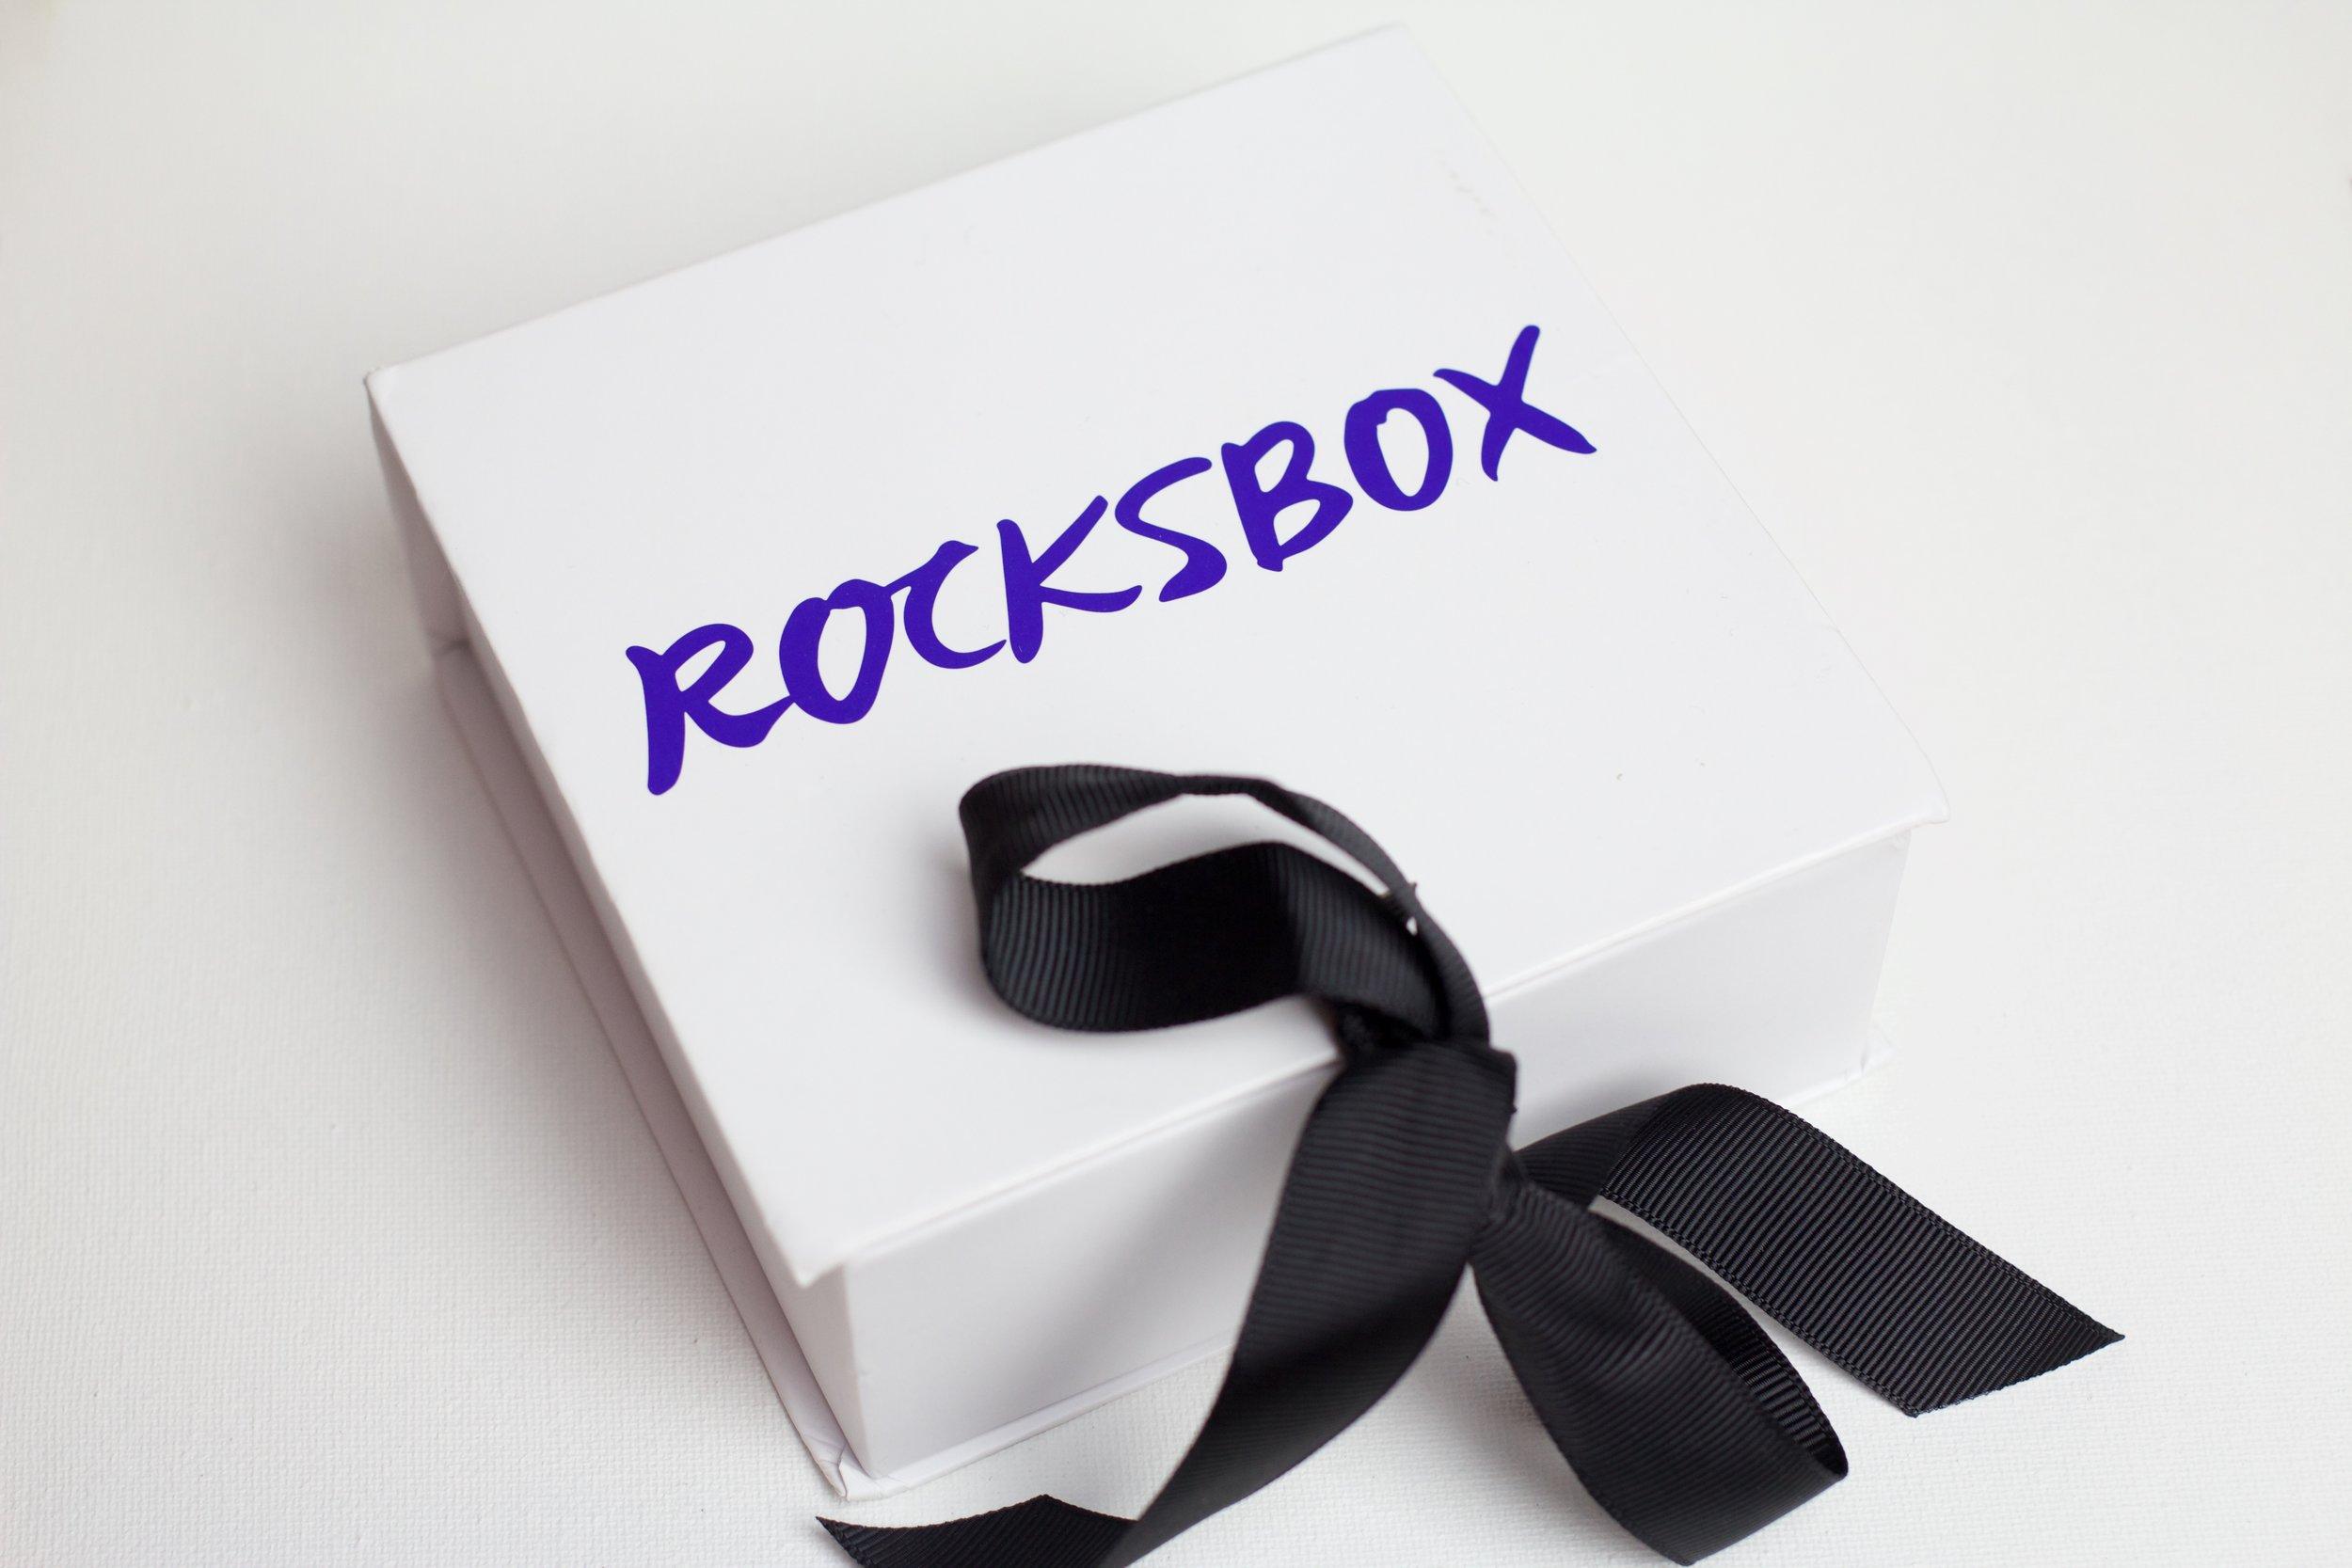 RocksBox-6.jpg